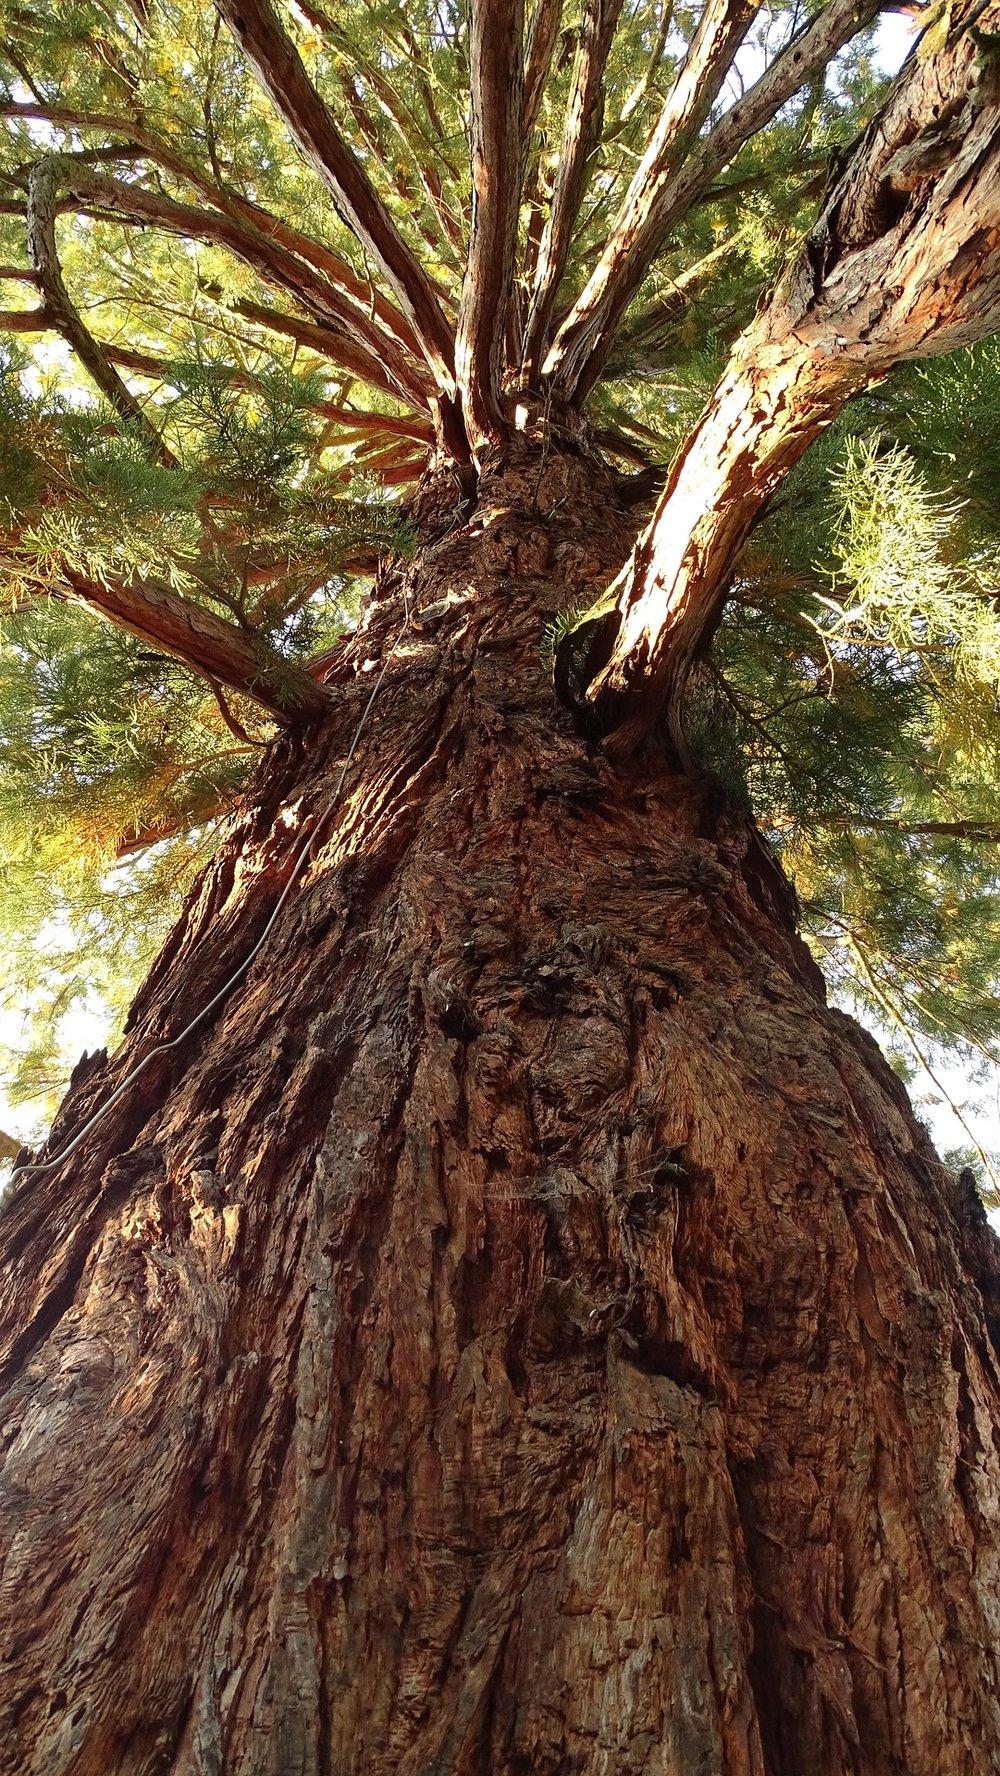 tree-2049877_1920.jpg